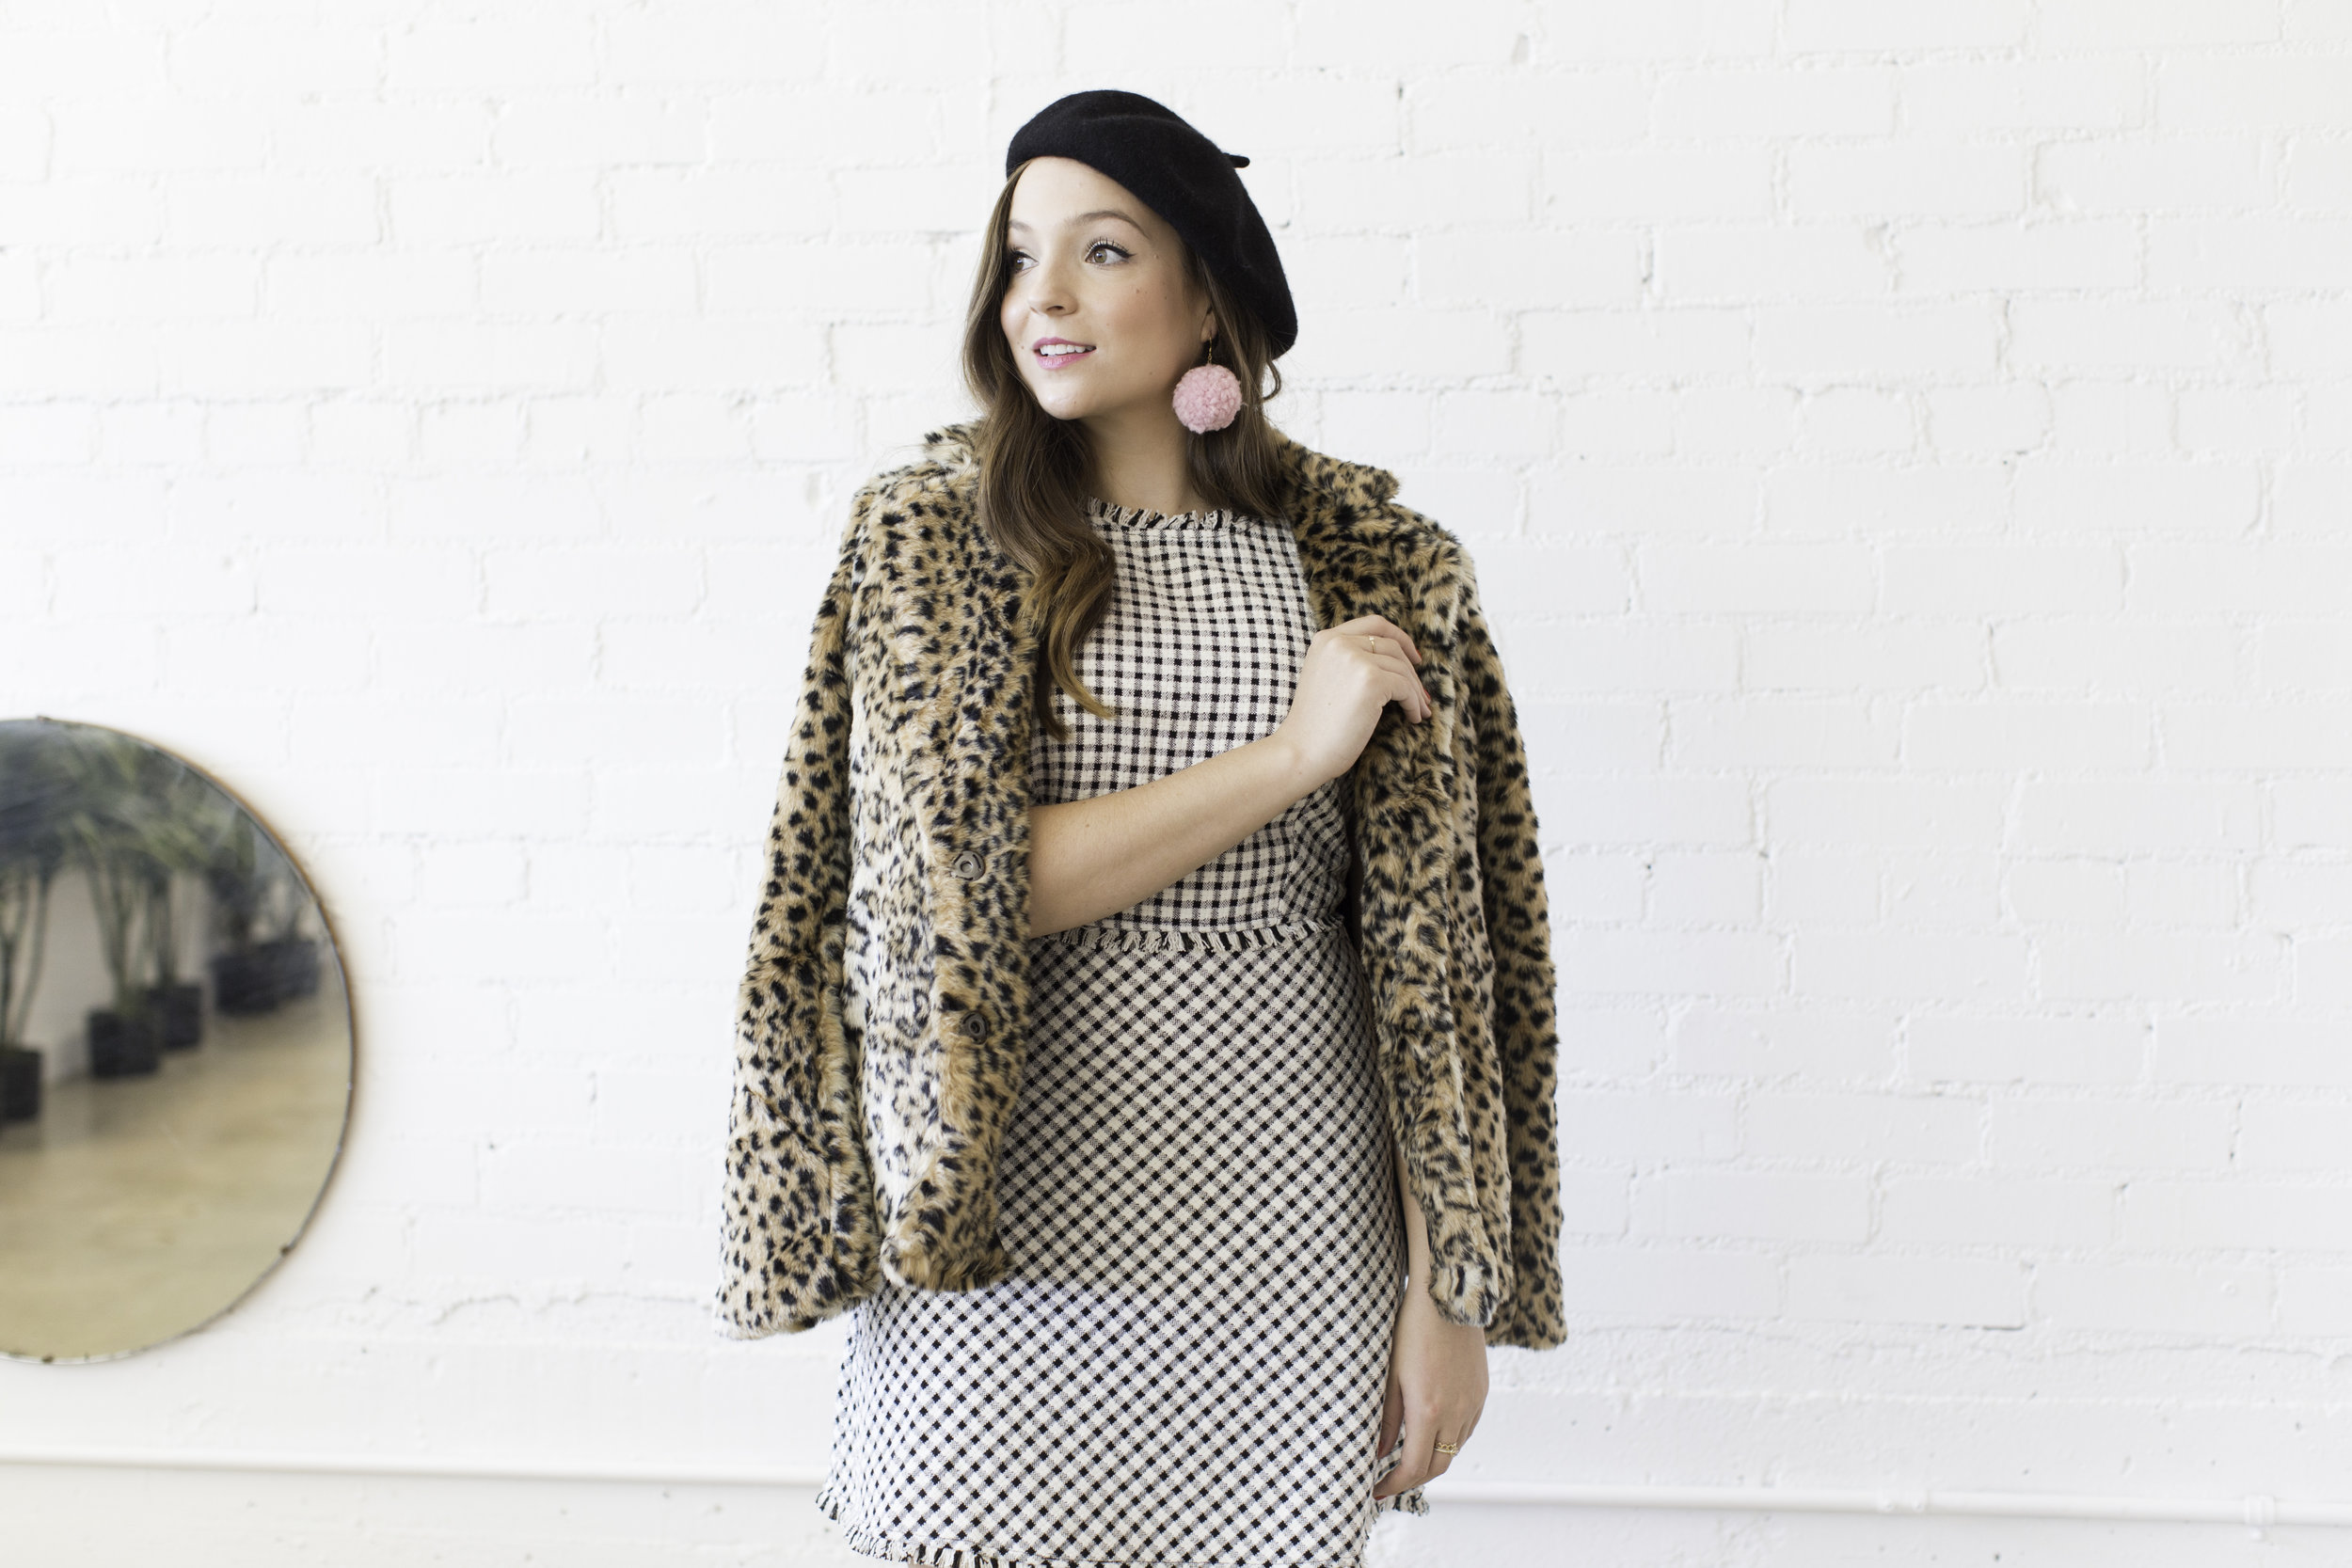 Parisienne Look // Sarah La Vie